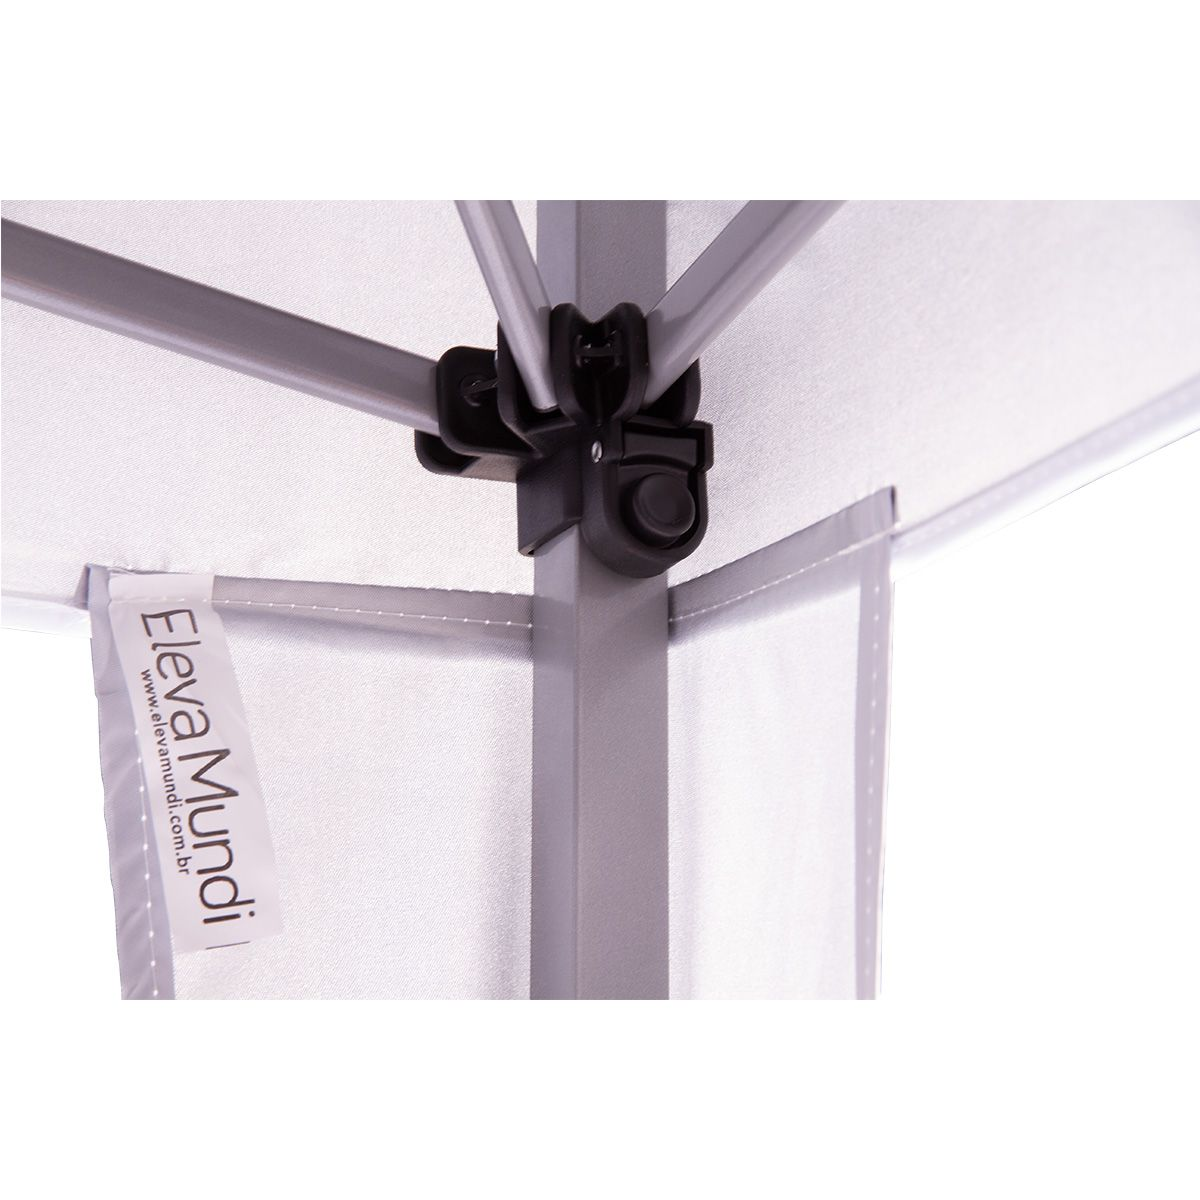 Gazebo 2x2 Articulado com Sistema Flexi Lock Eleva Mundi - Branco